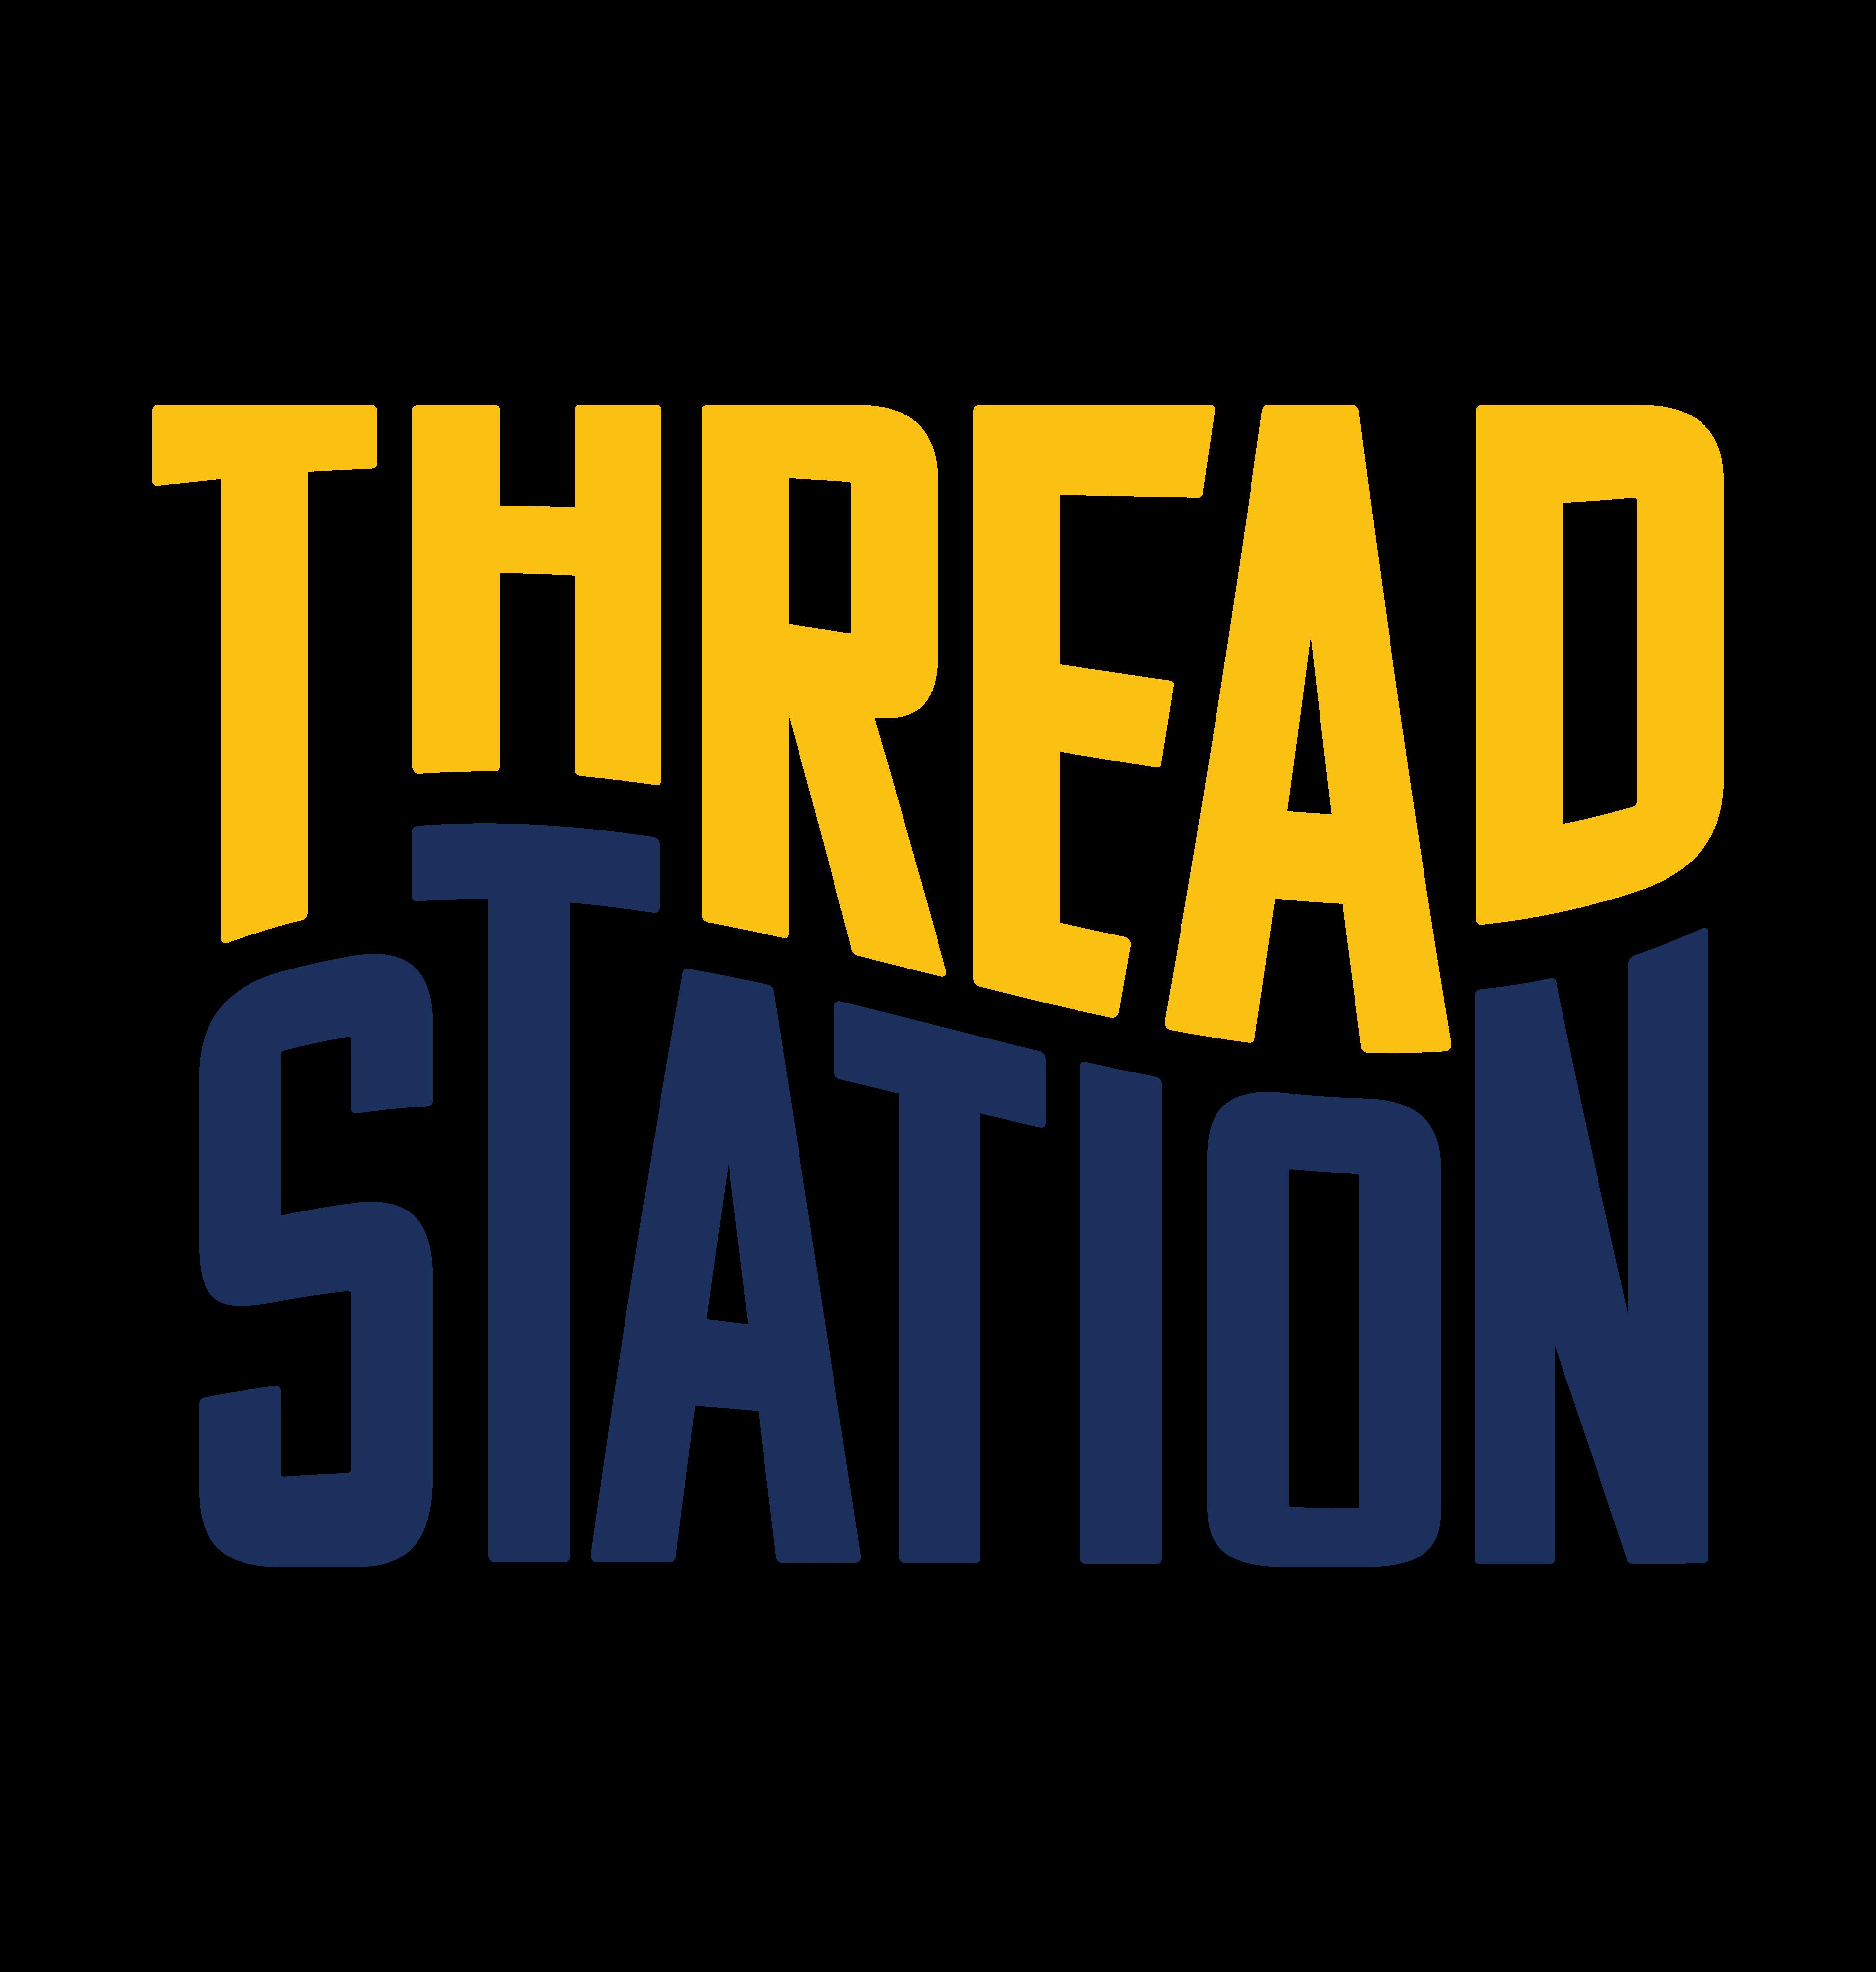 ThreadStation